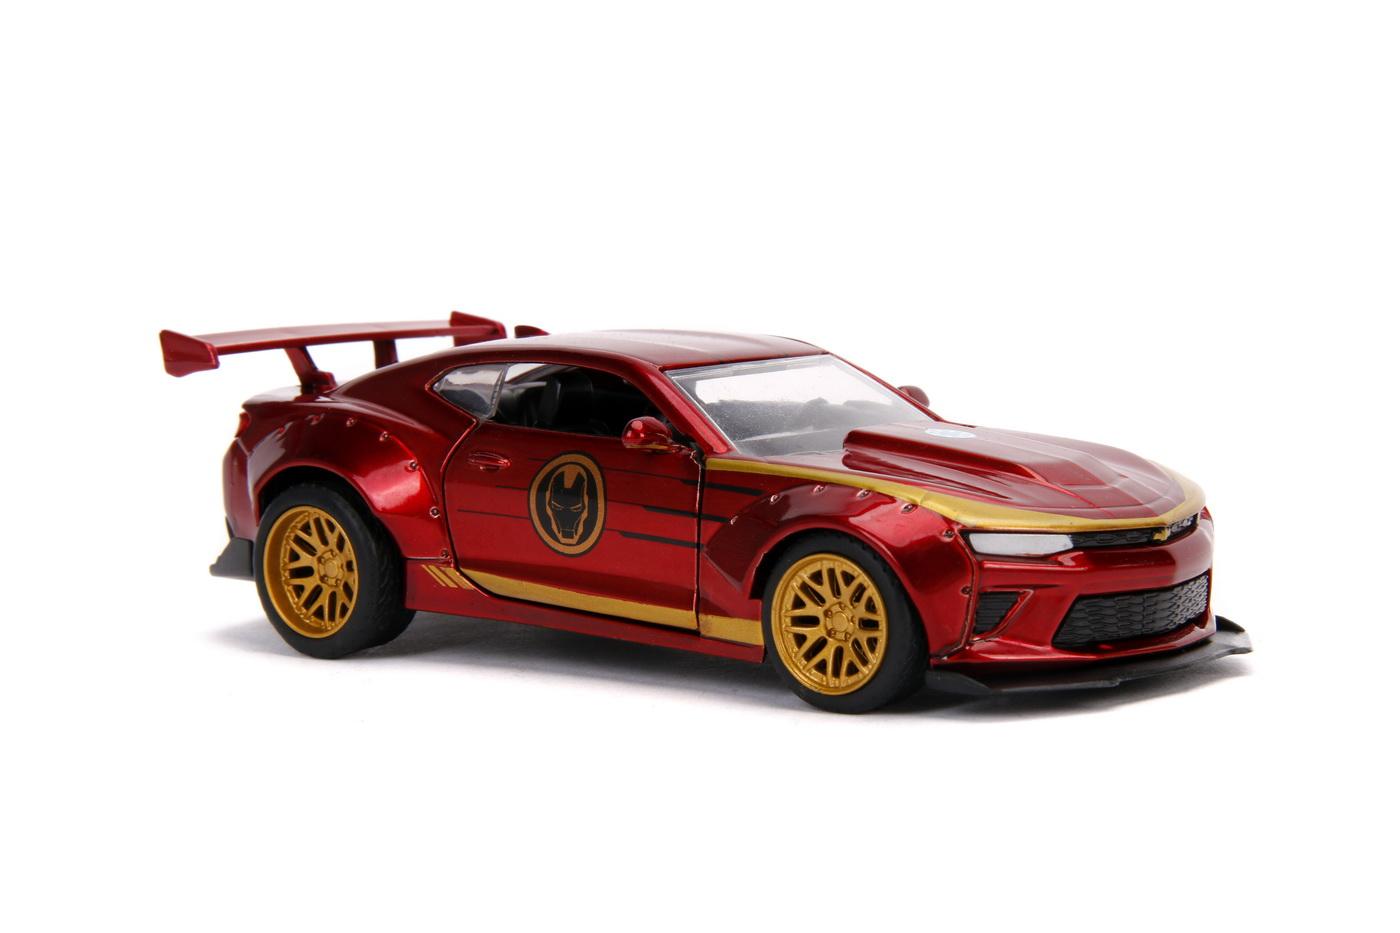 Masinuta Metalica Iron Man 2016 Chevy Camaro Ss Scara 1 La 32 | JadaToys - 3